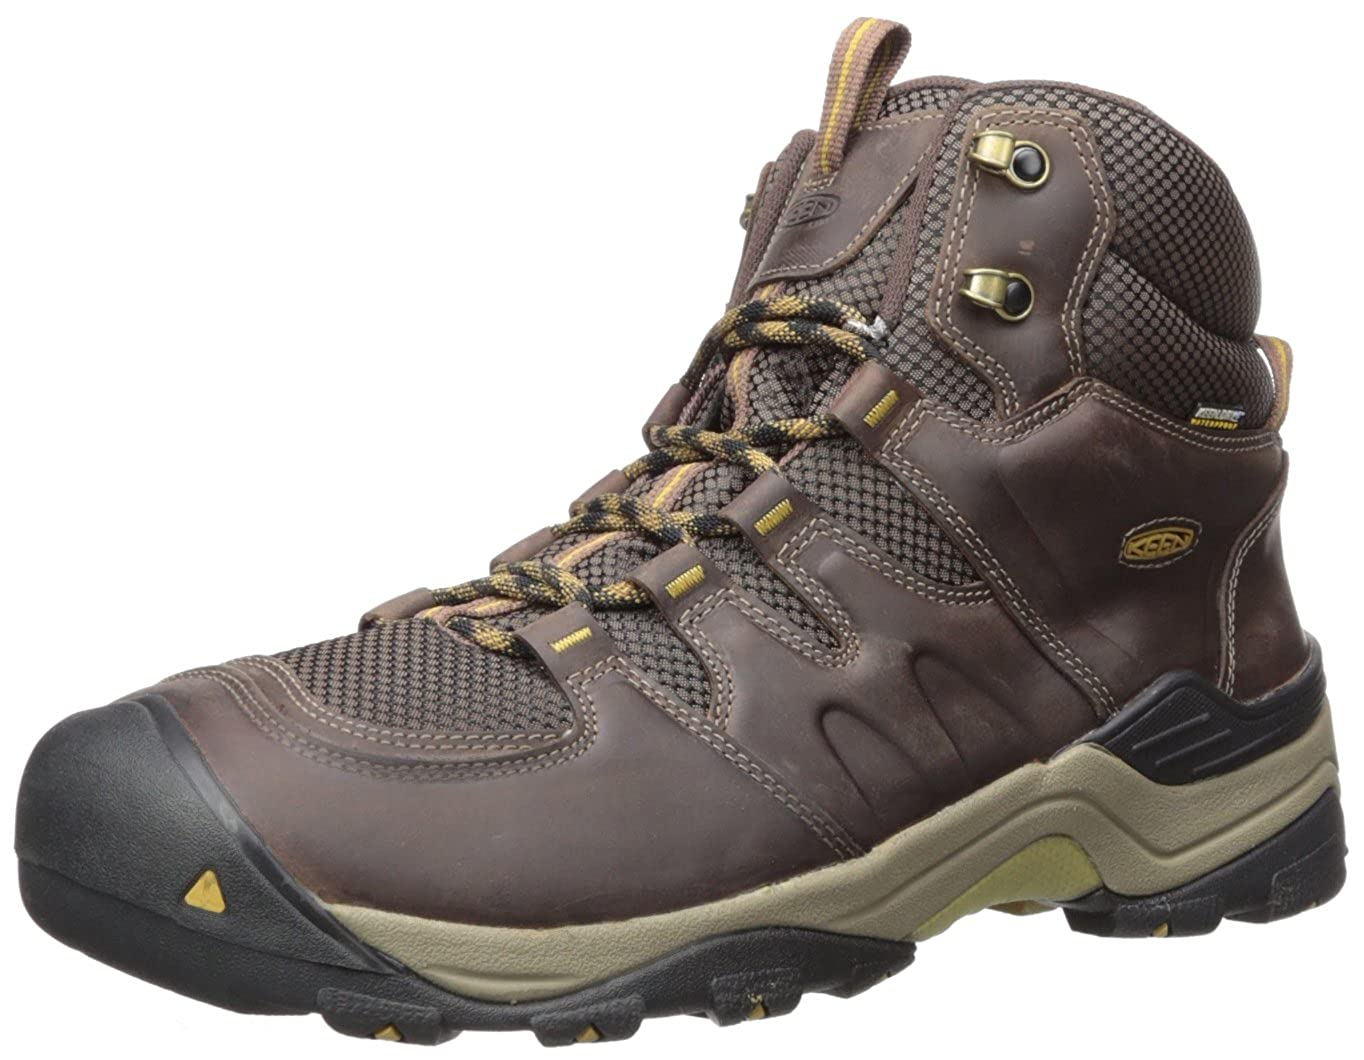 Marron (Coffee Bean Bronze Mist) 39.5 EU KEEN Gypsum II Mid WP, Chaussures de Randonnée Hautes Homme